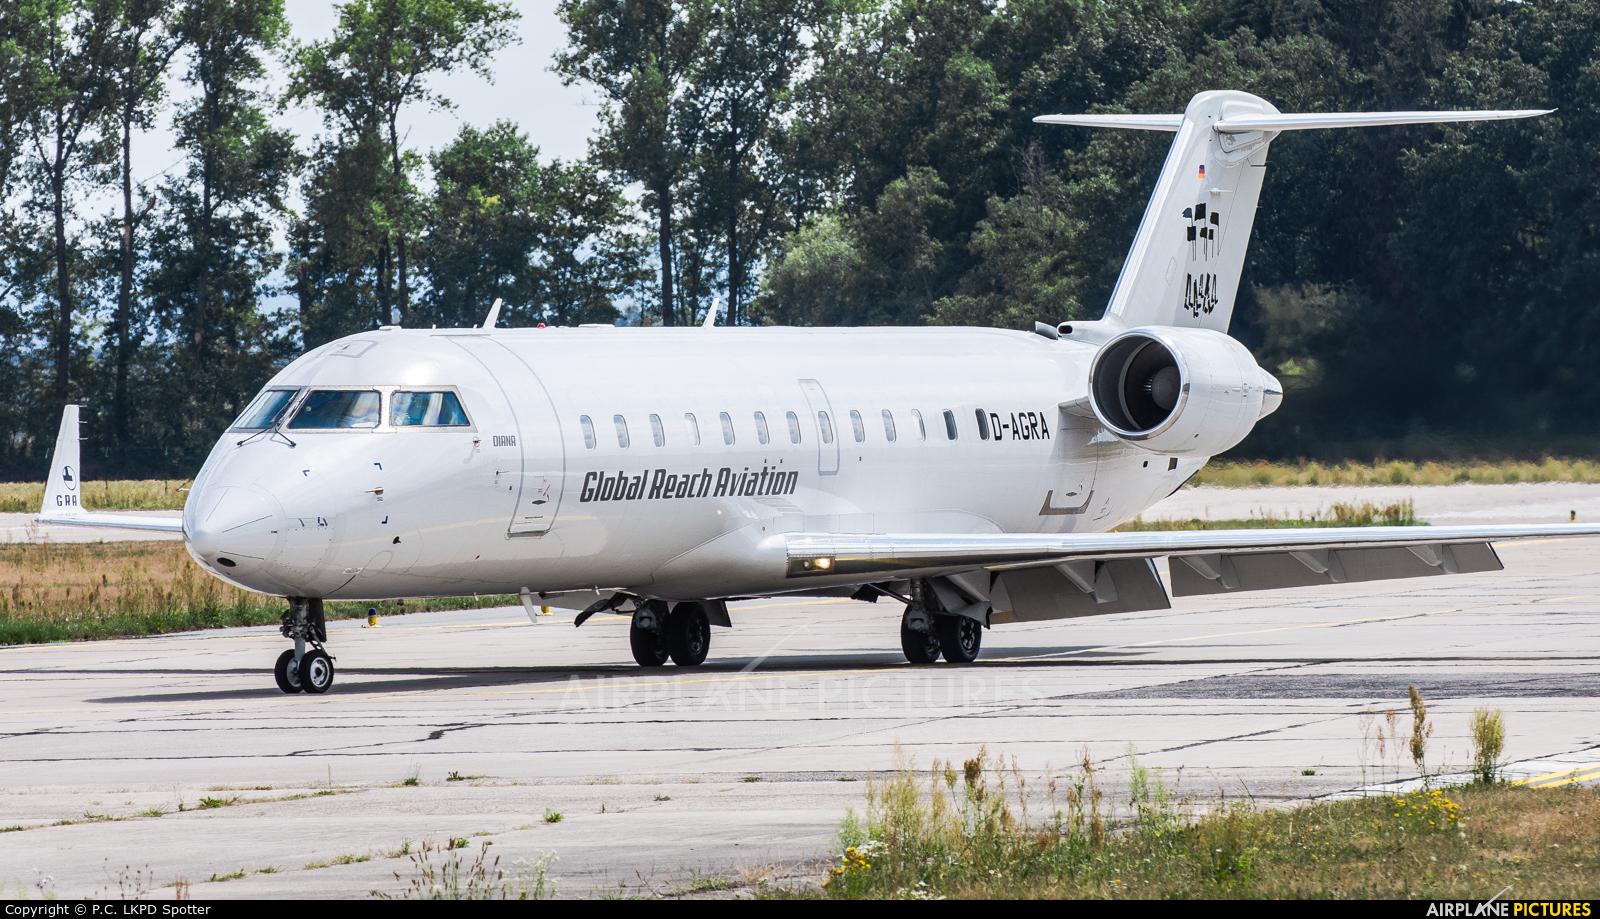 Global Reach Aviation D-AGRA aircraft at Pardubice